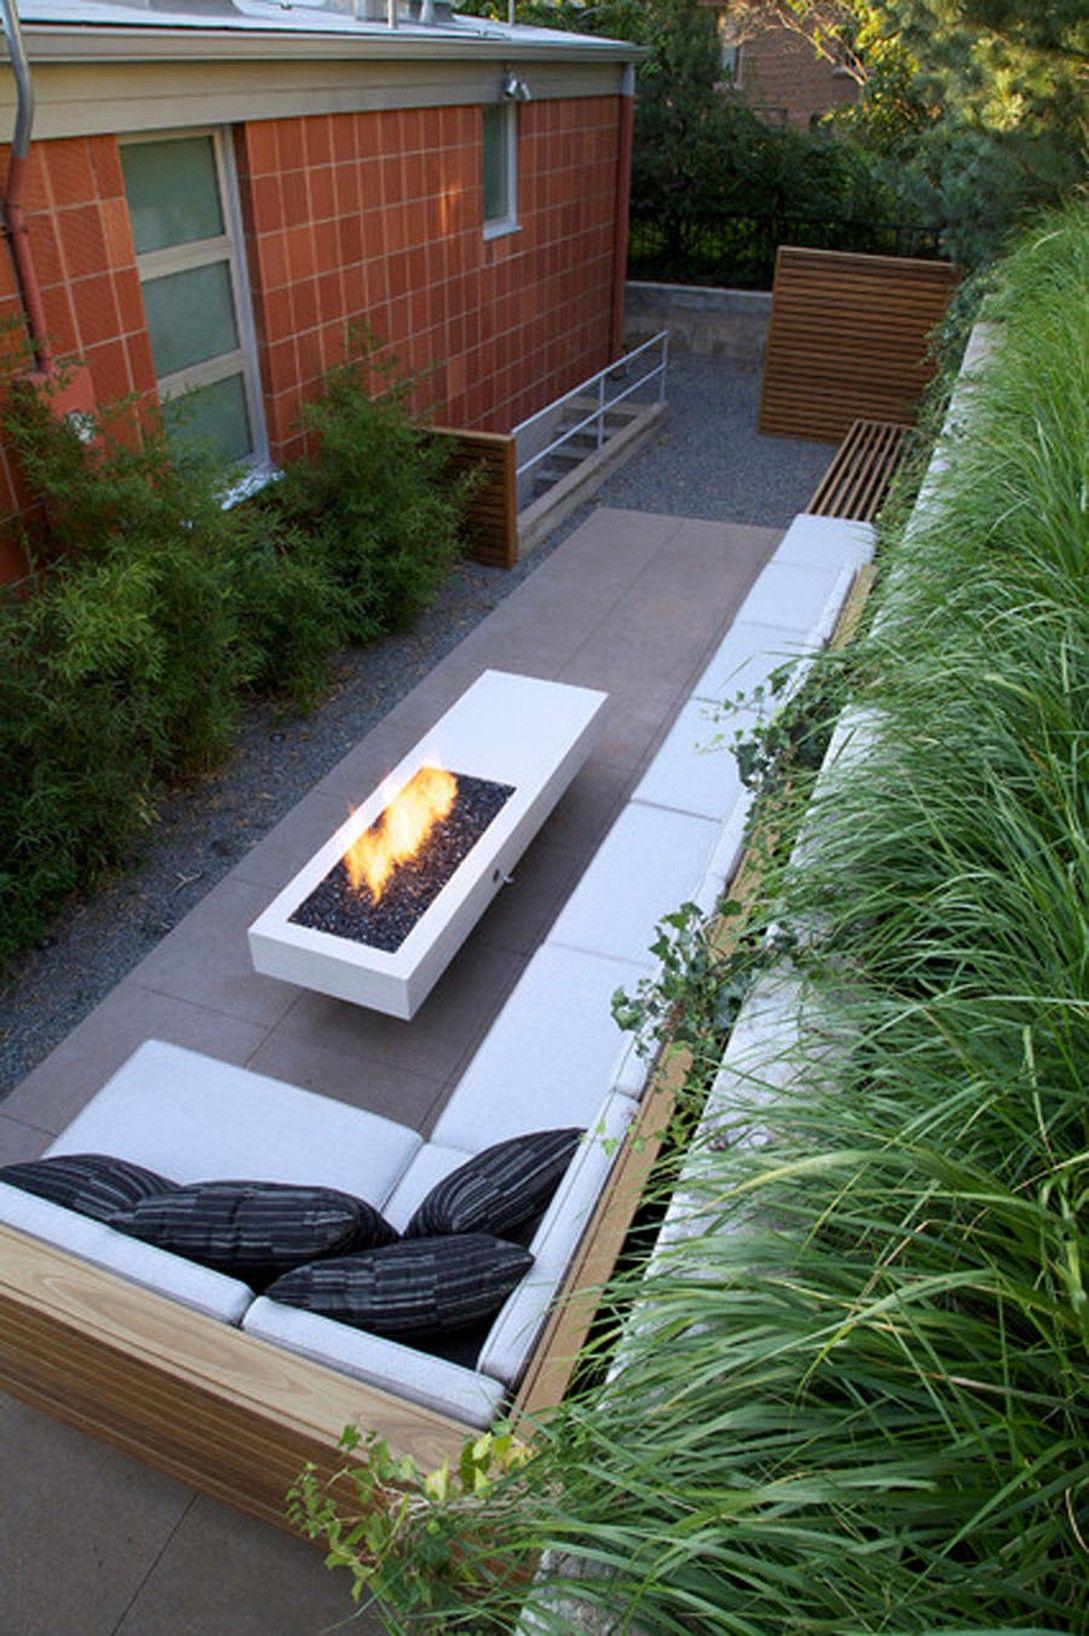 15 Modern Patio Design Ideas 4 In 2020 Small Backyard Patio Backyard Layout Narrow Backyard Ideas